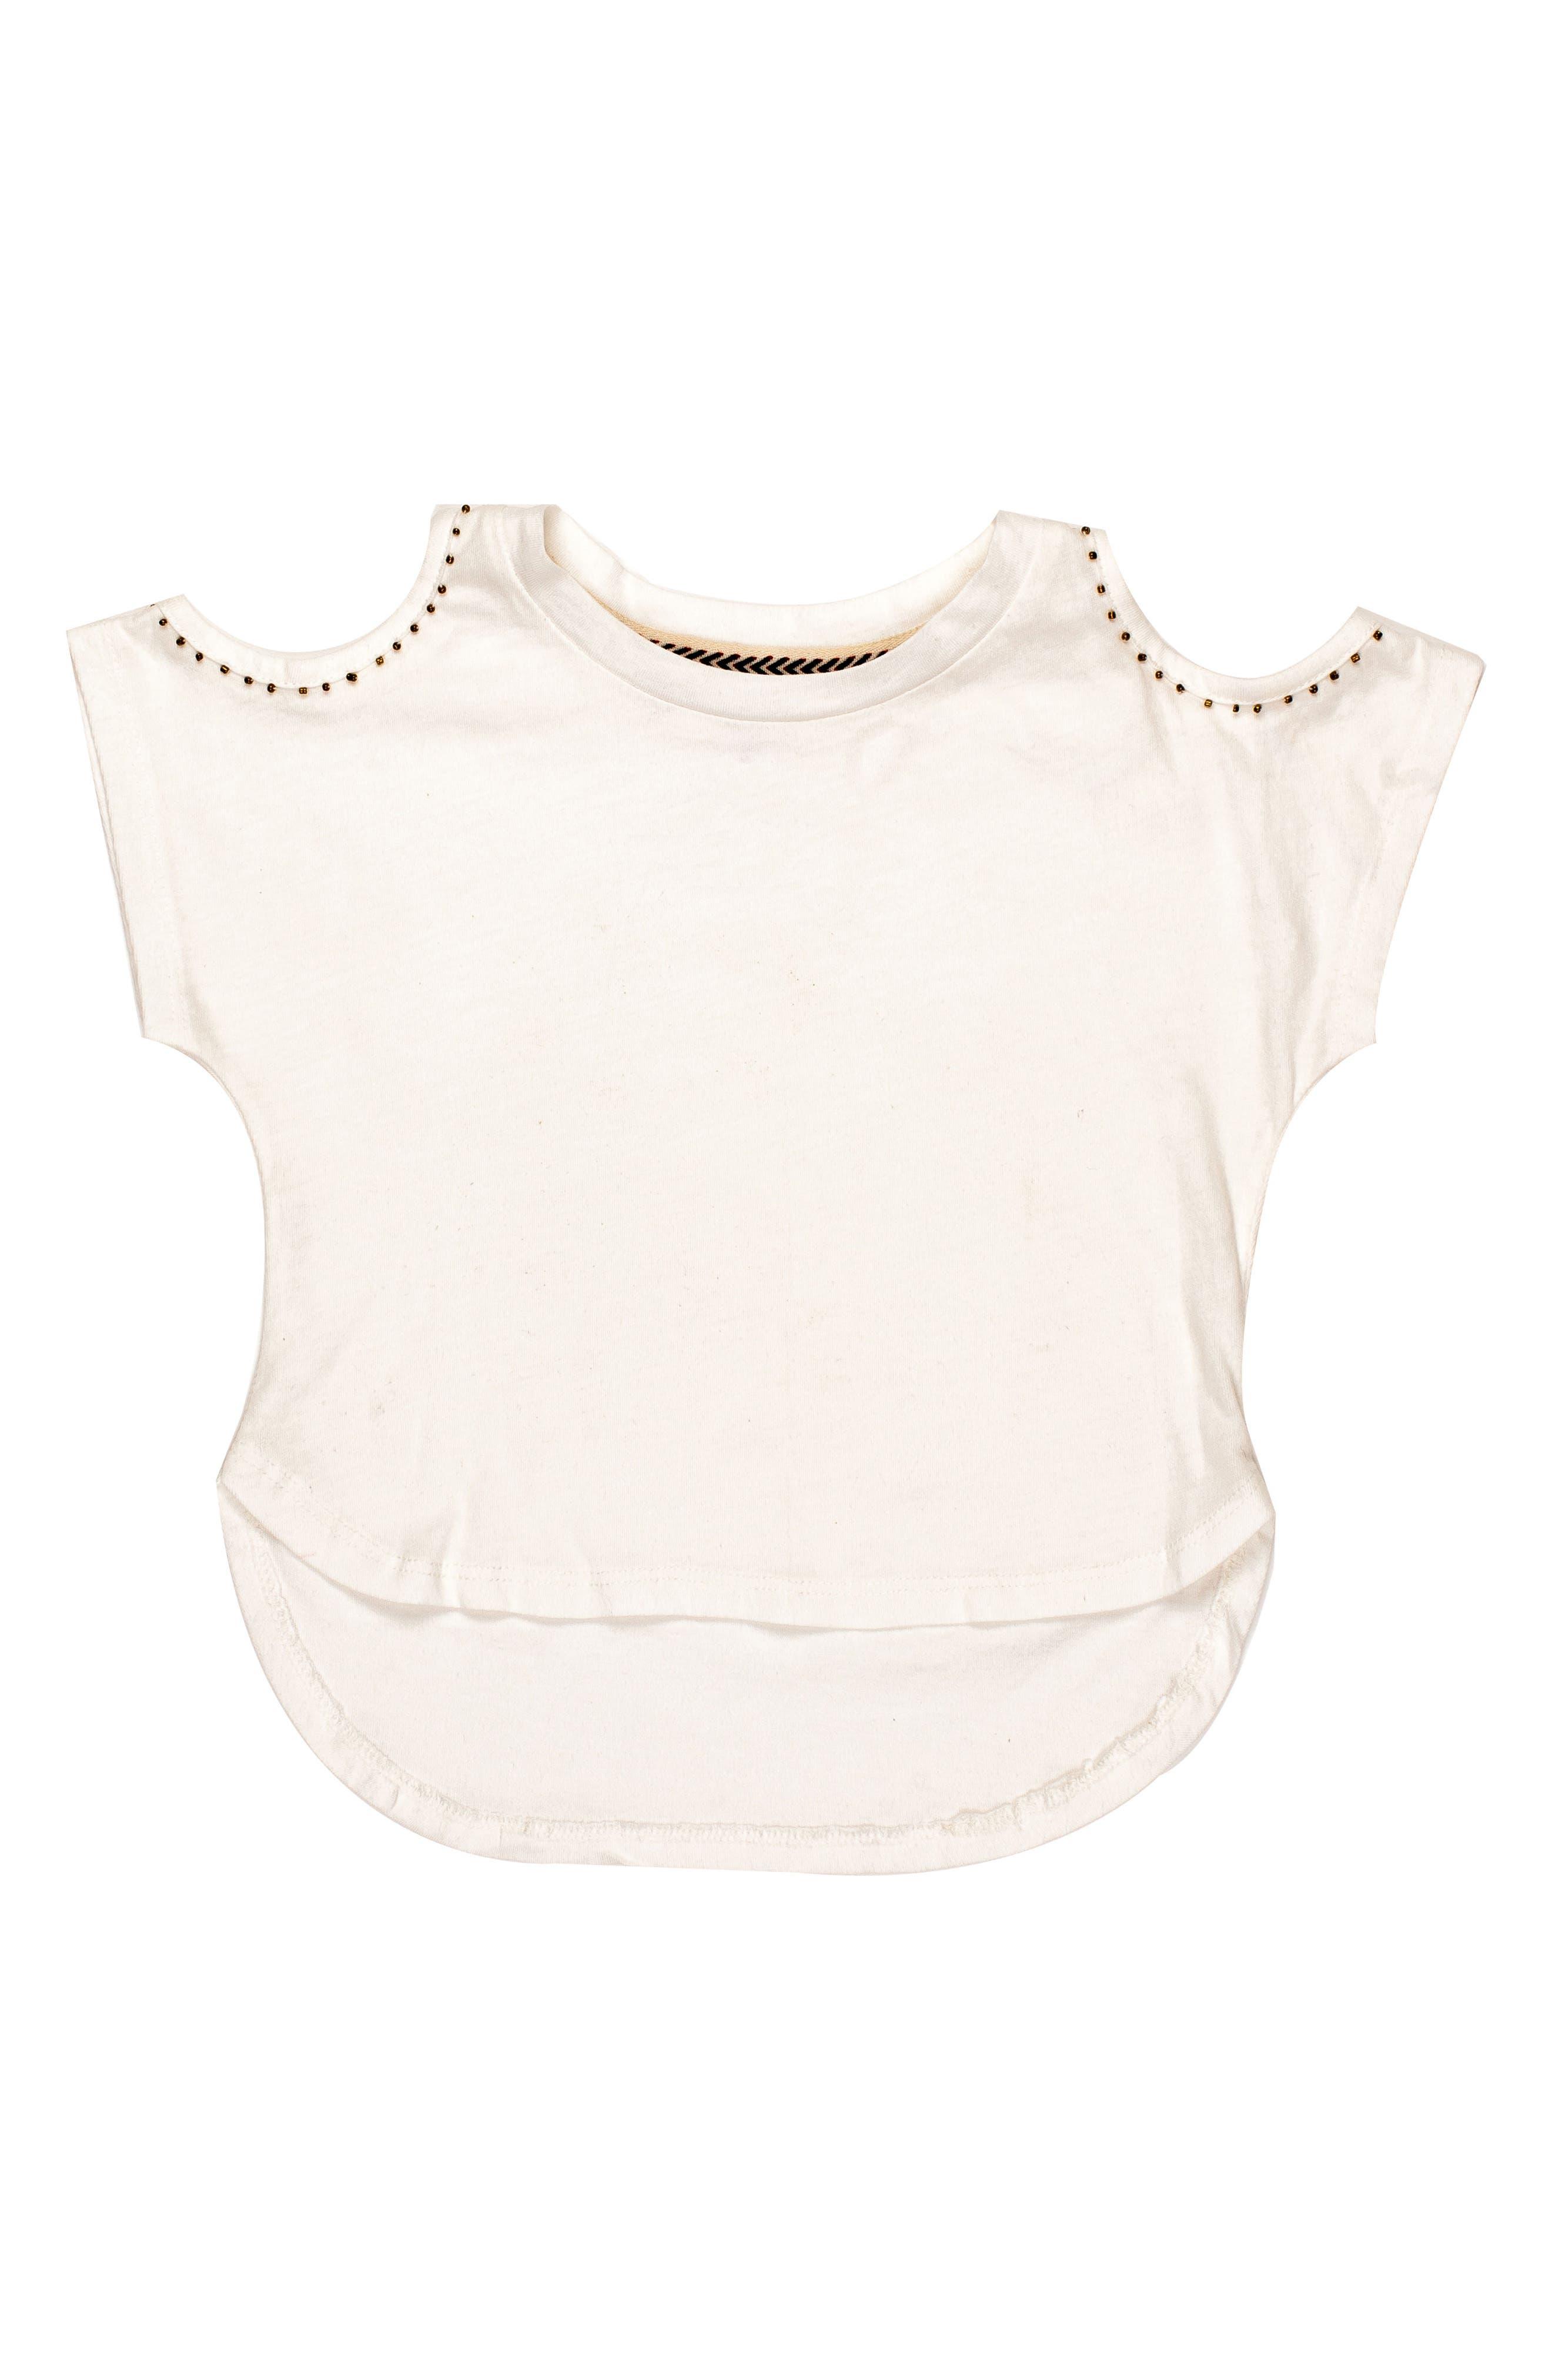 BOWIE X JAMES Oasis Beaded Cold Shoulder Tee (Toddler Girls, Little Girls & Big Girls)